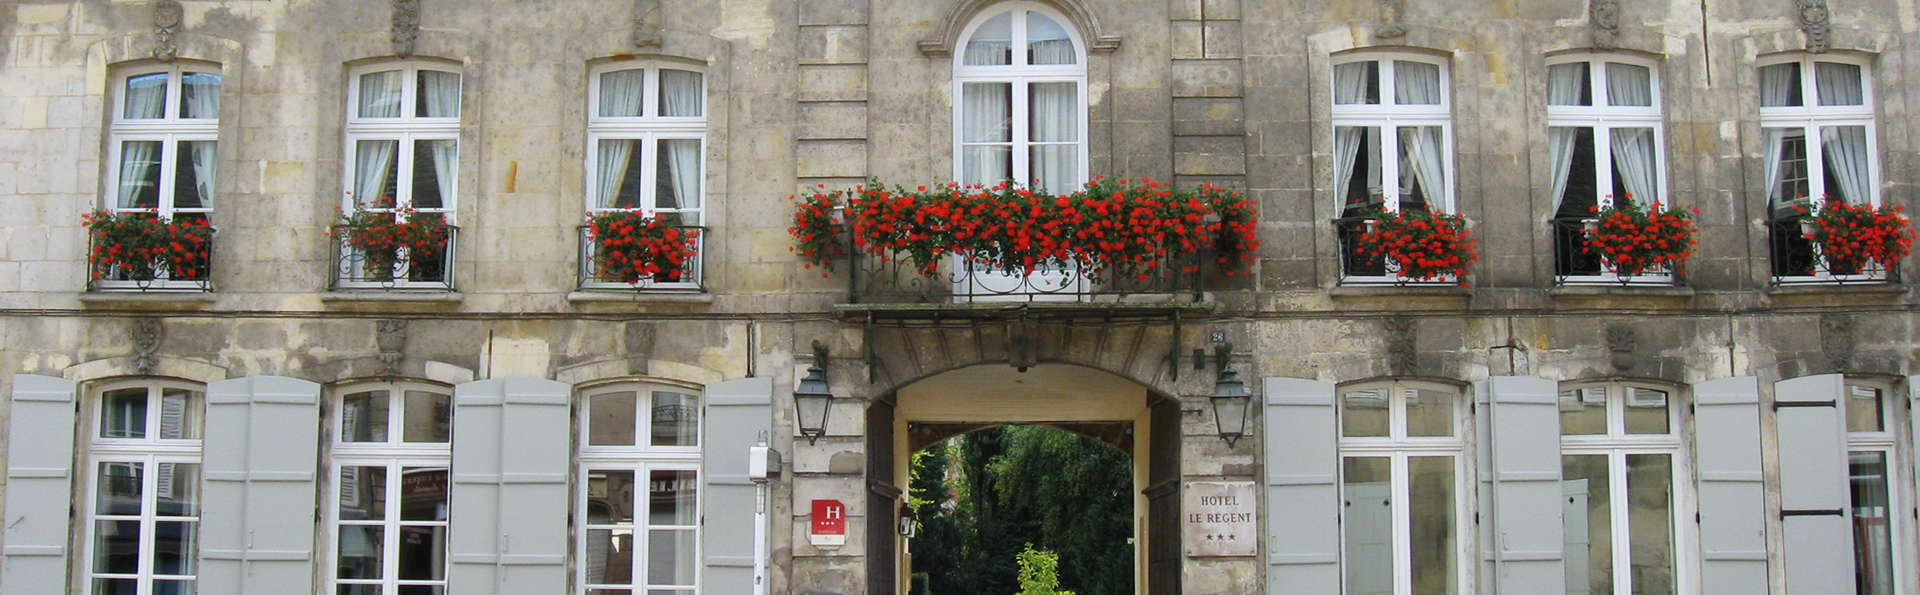 Hôtel Le Régent - Edit_Fachada_1.jpg